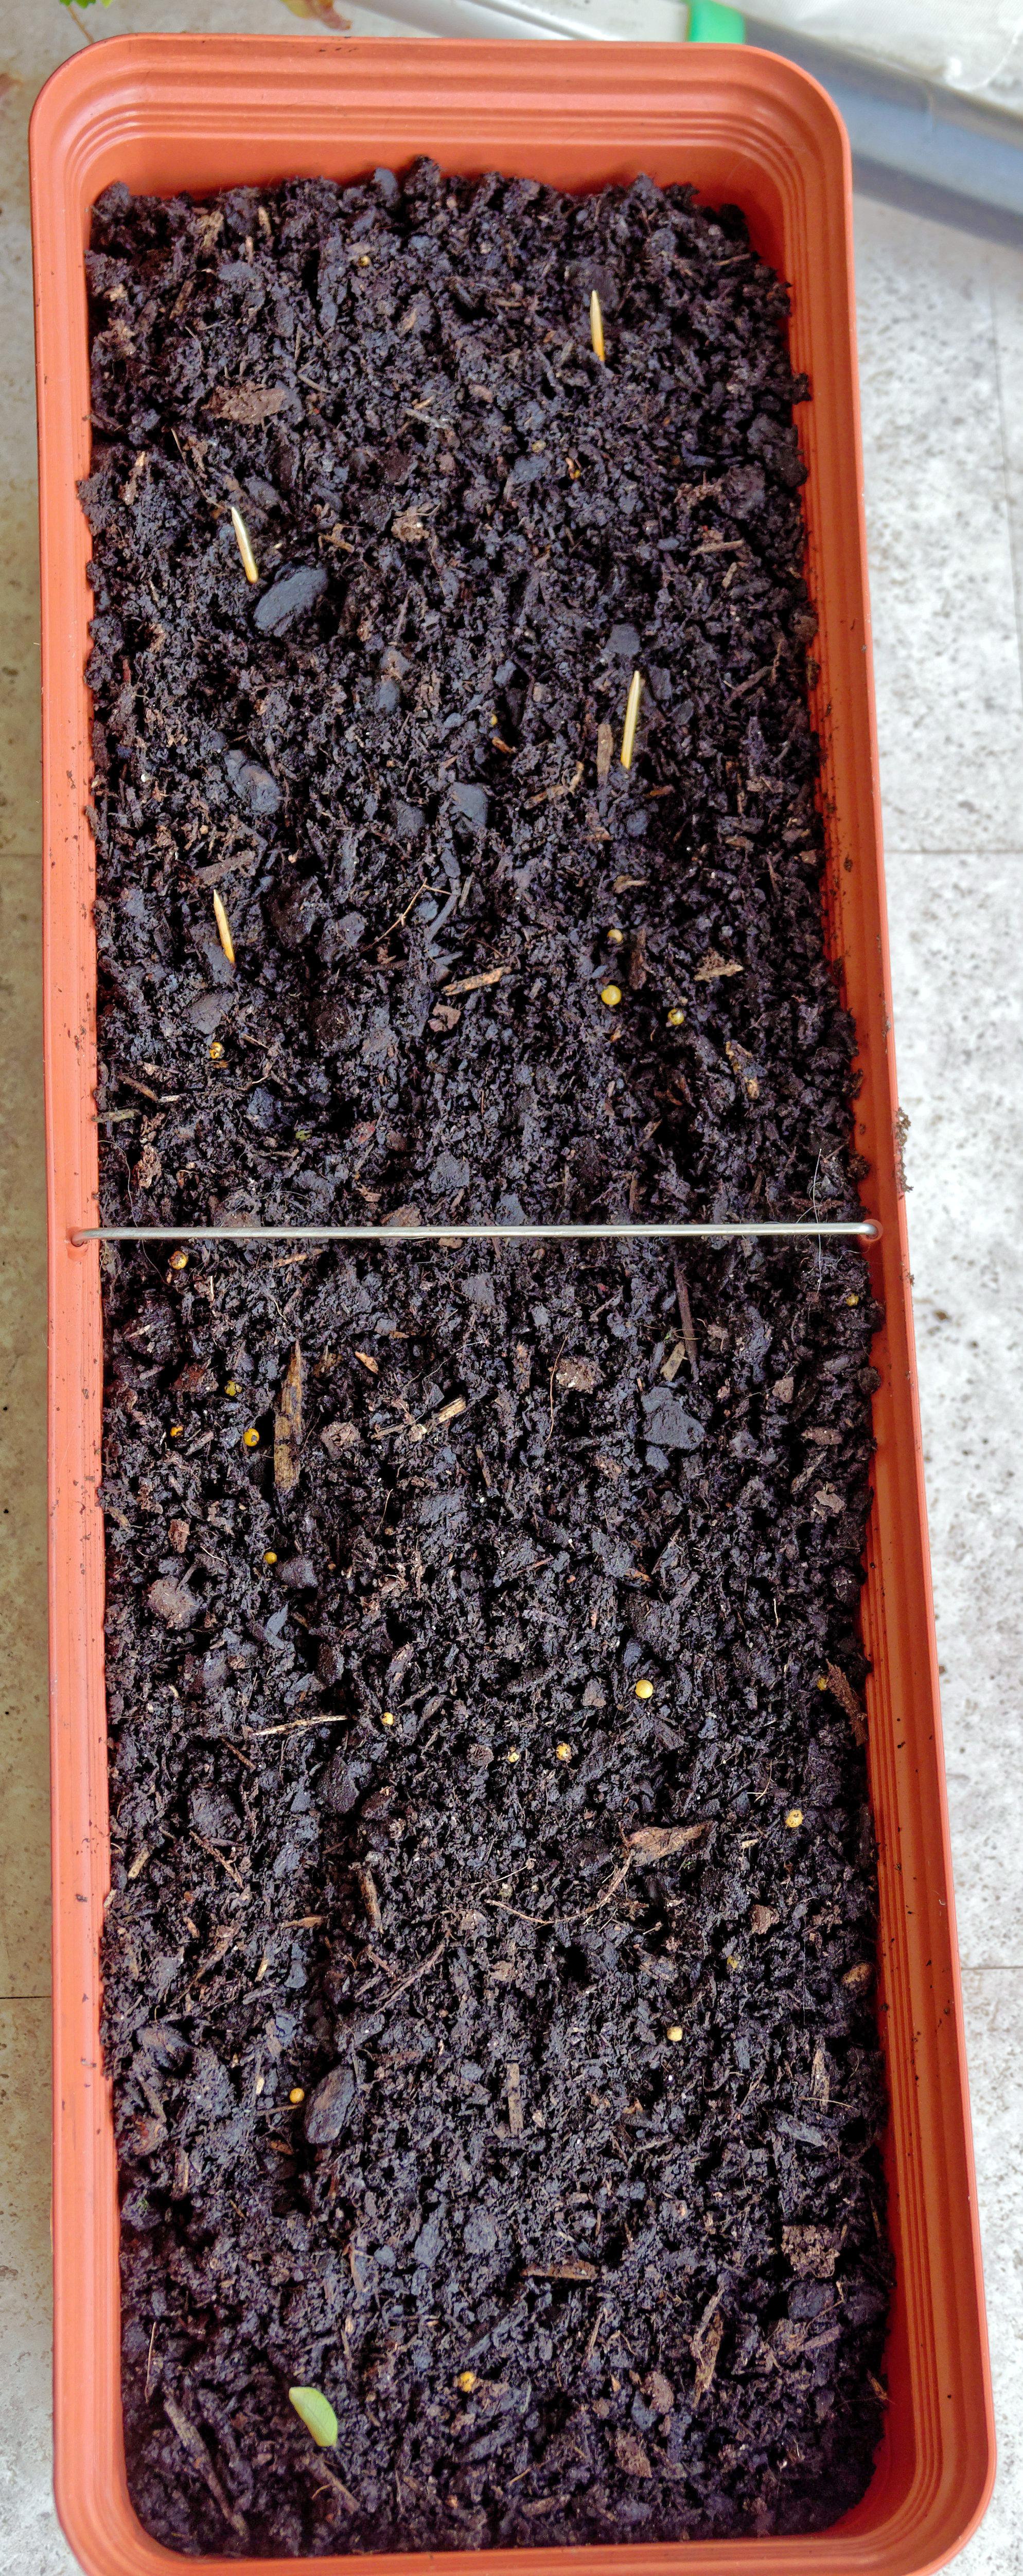 Planting-basil.jpeg